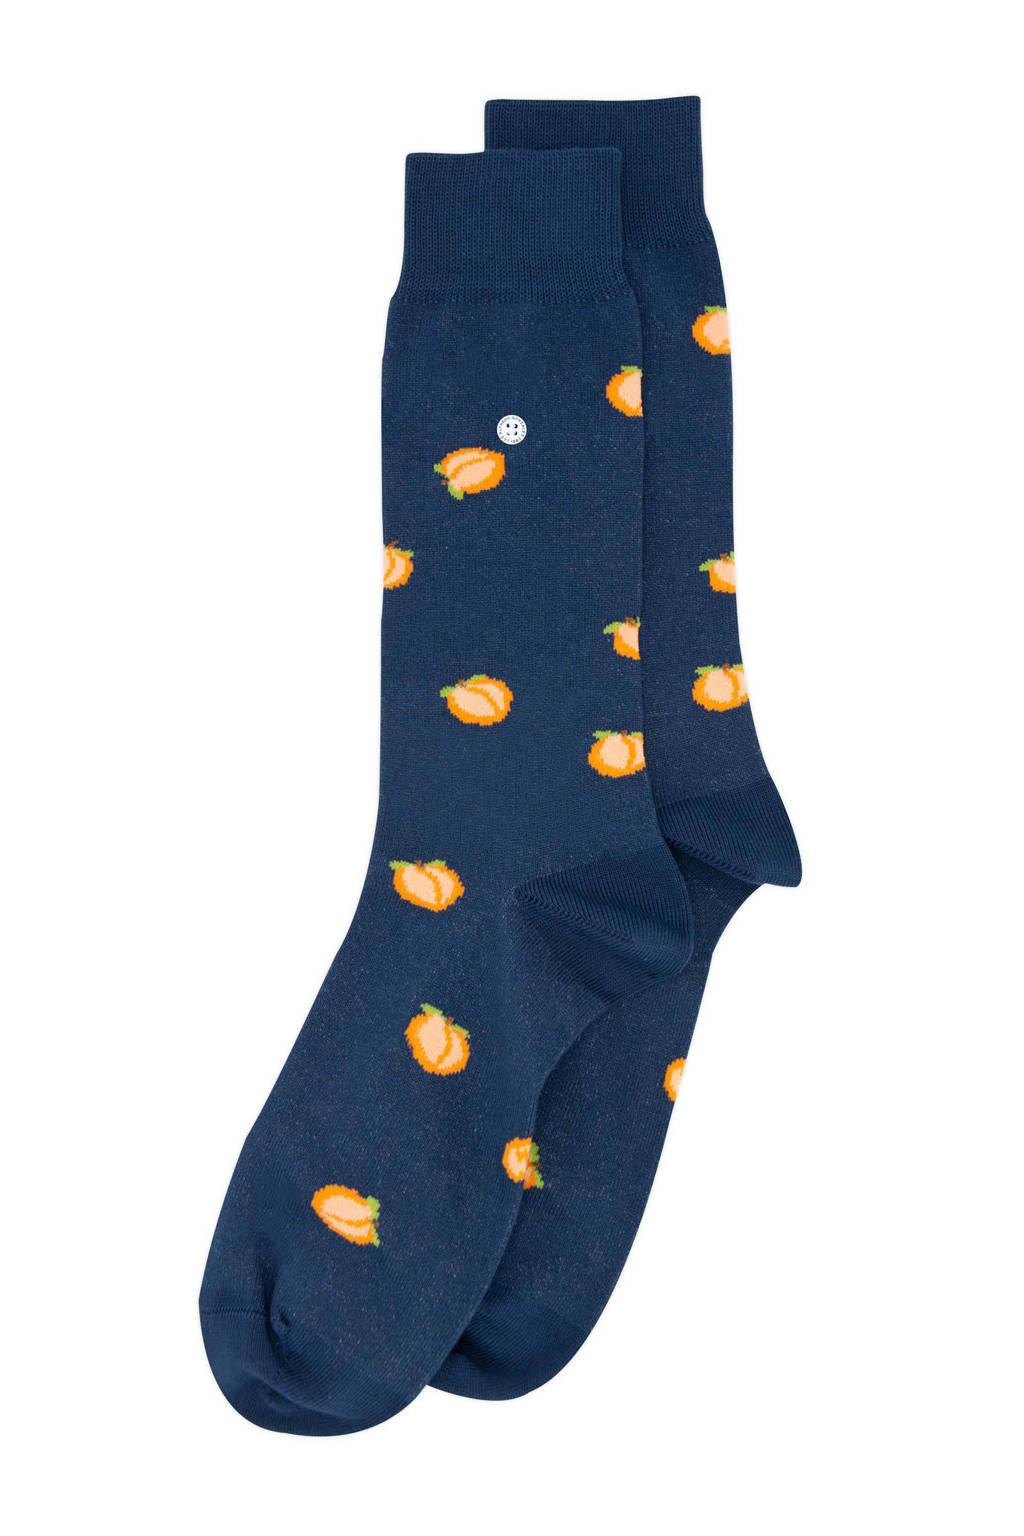 Alfredo Gonzales sokken Peach donkerblauw, Donkerblauw